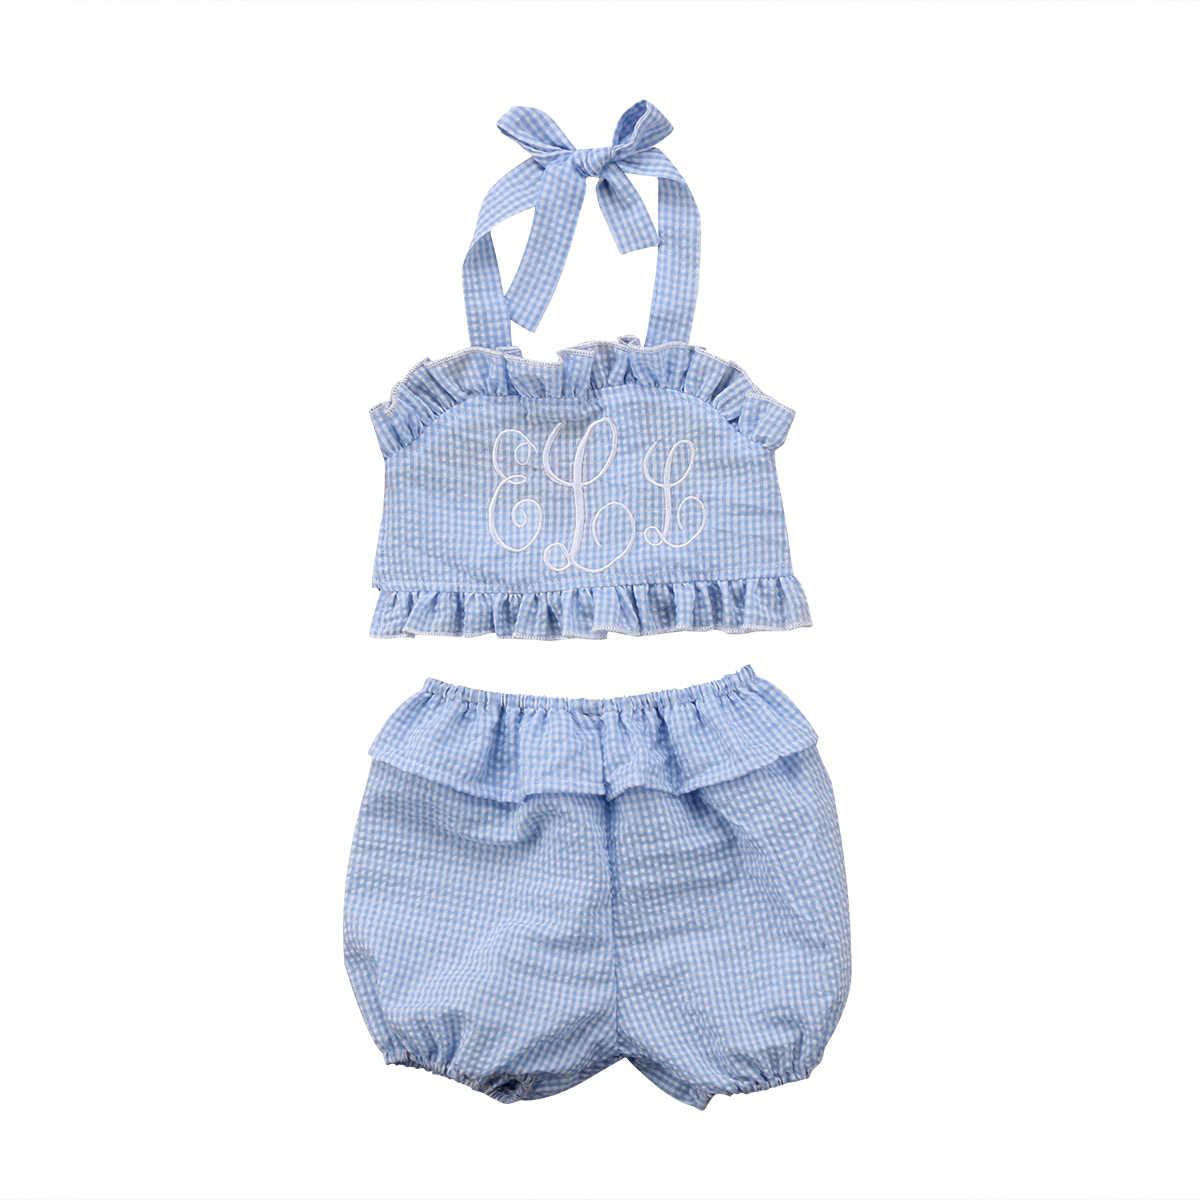 ede69b8c29 Toddler Baby Girl Swimwear Two-Pieces Seersucker Bikini Bathing Suits  Beachwear Kids Swimming Costume